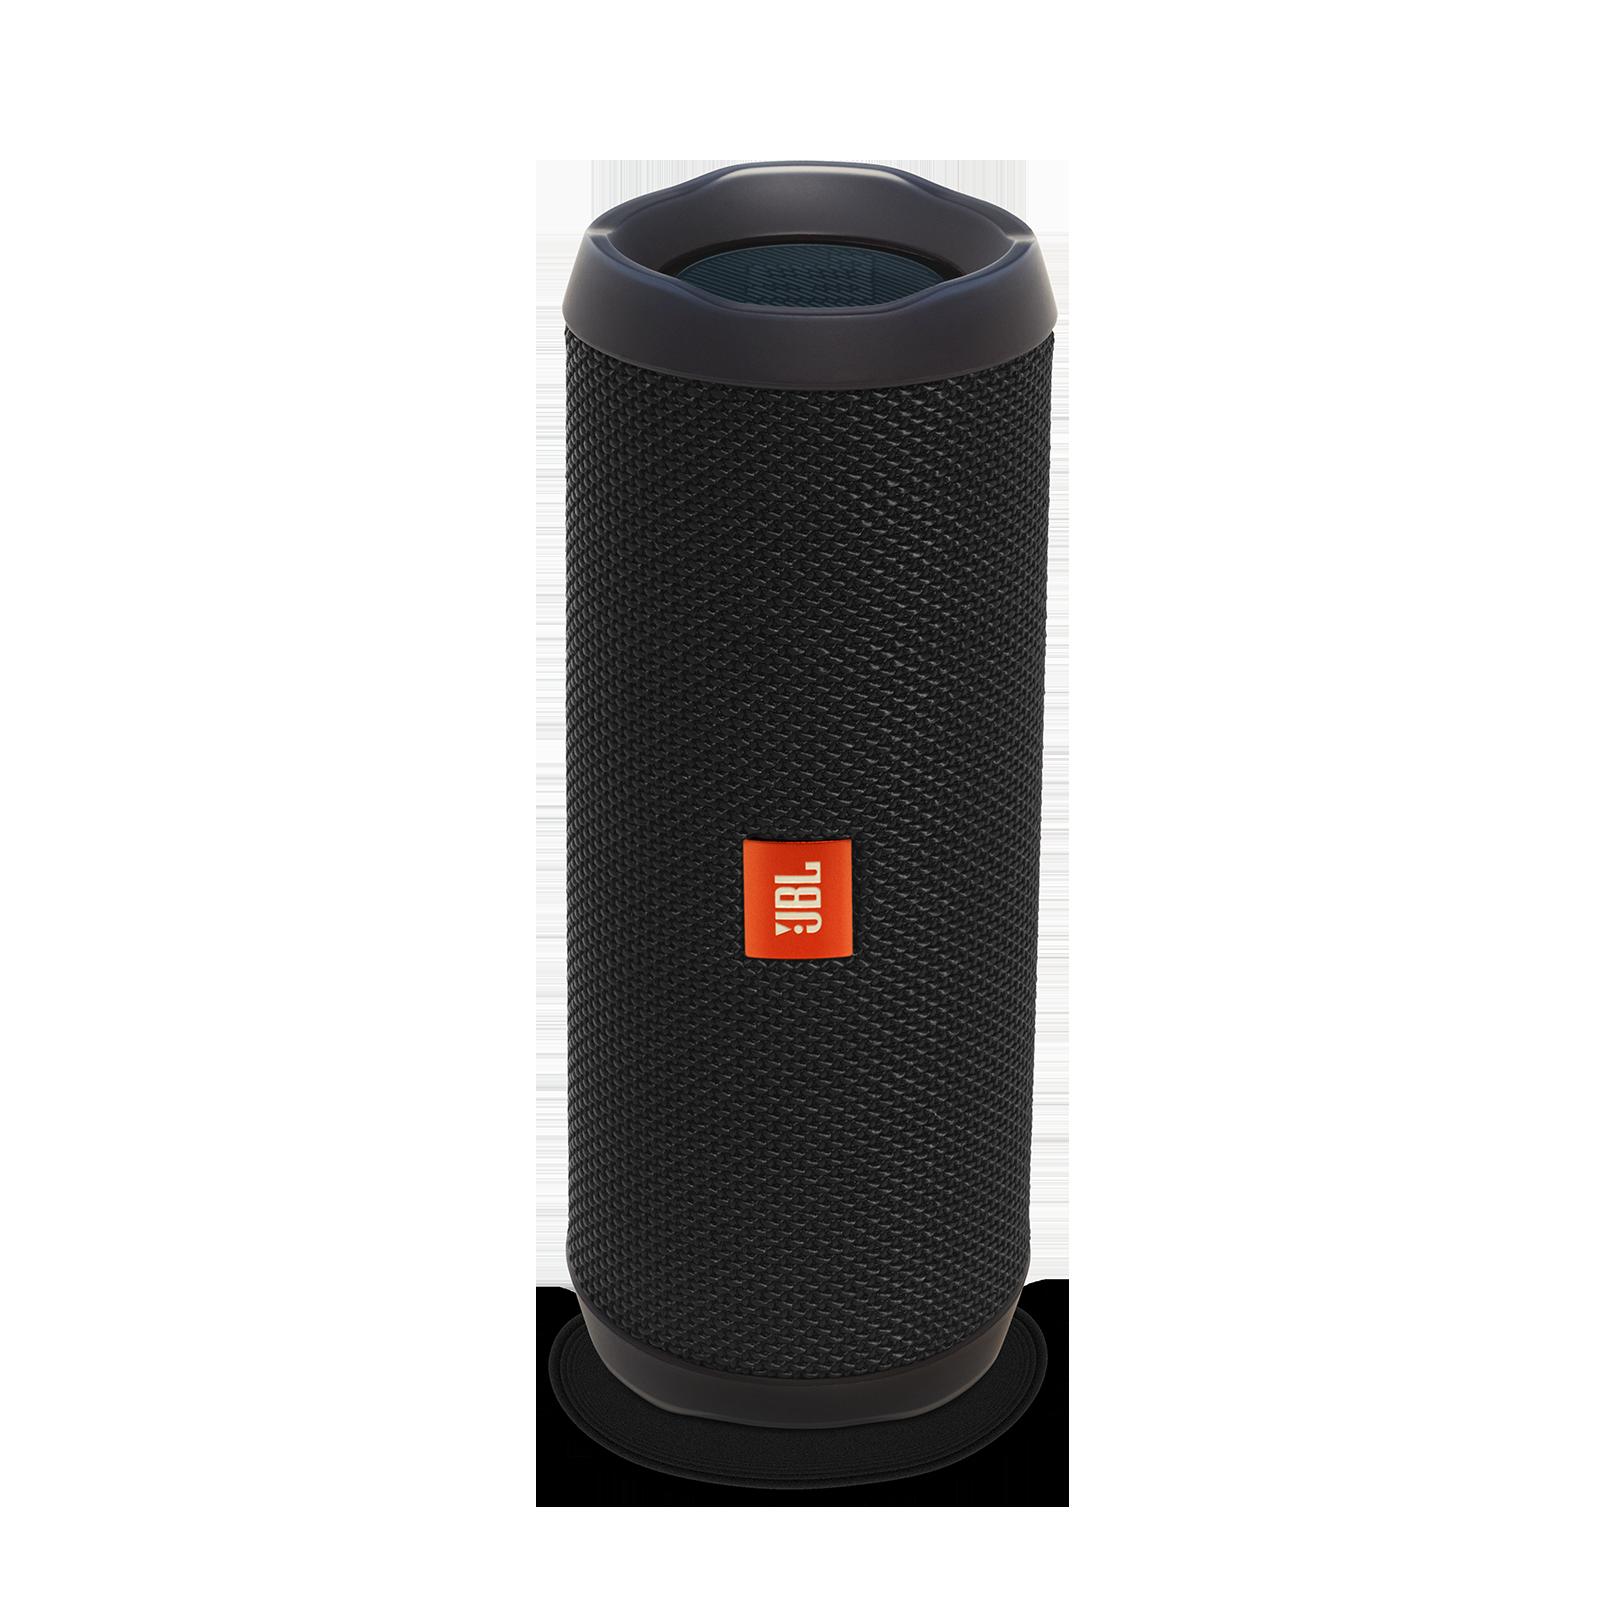 JBL Flip 4 | Portable Bluetooth Speakers | JBL US